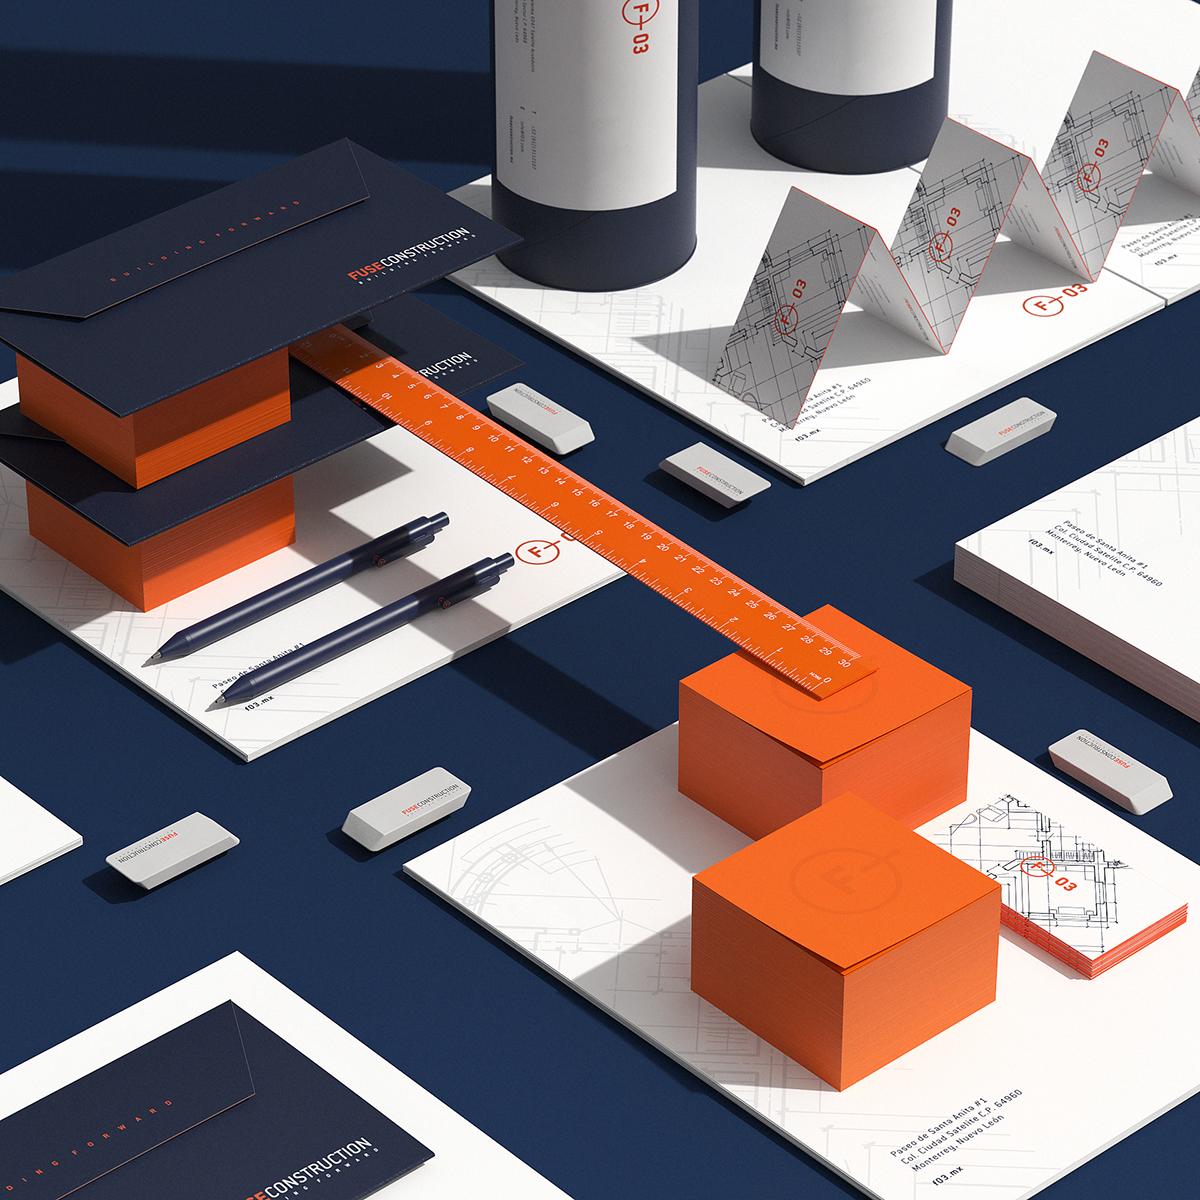 Urban construction city stationary architecture metropolis blueprints technical minimal modern